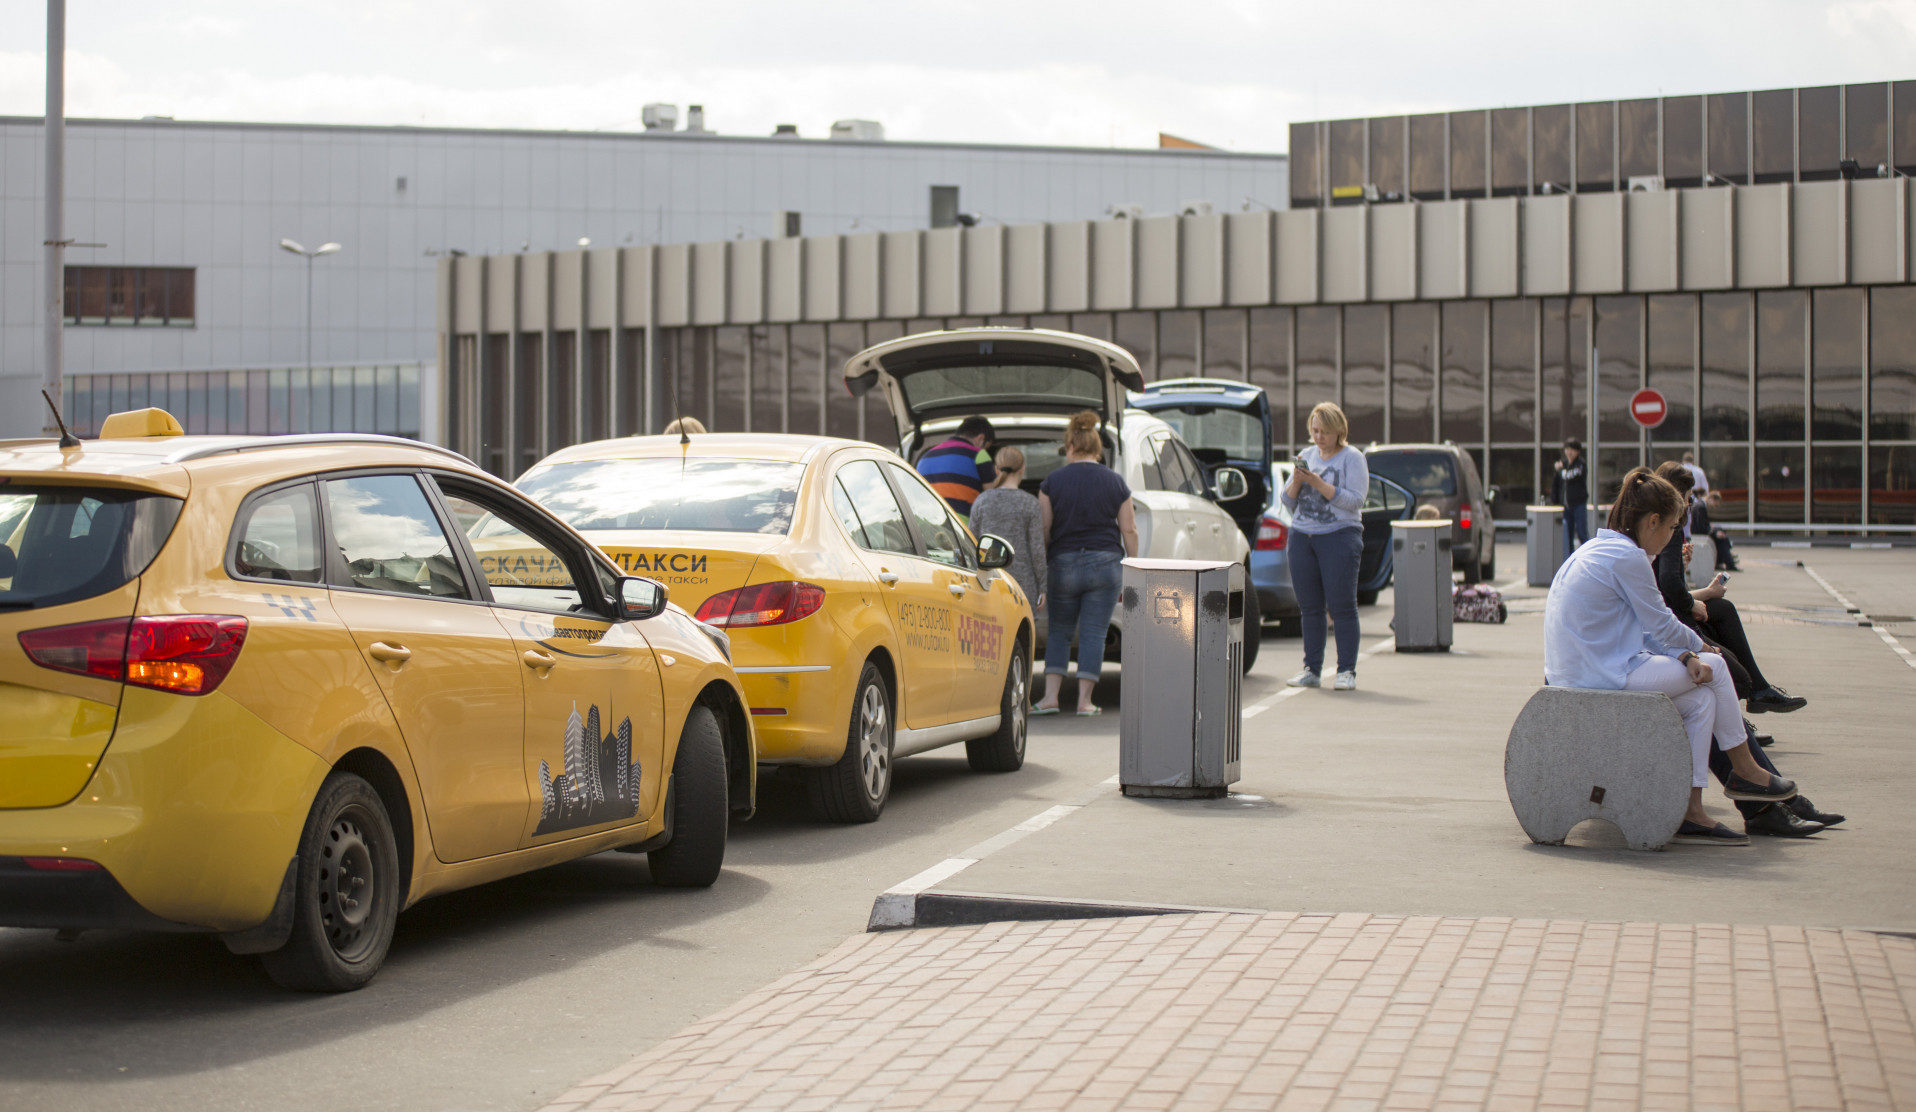 Поездка на такси за 500 000 рублей